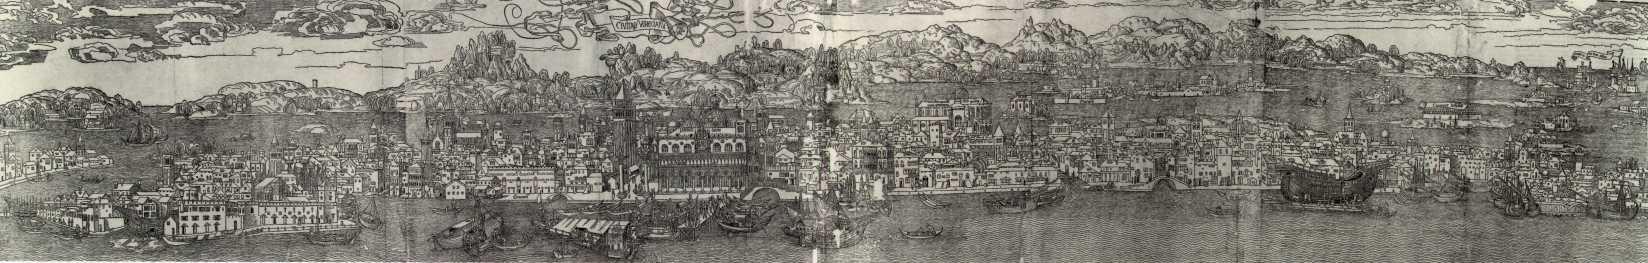 Civitas Veneciarum di Erhard Reuwich del 1486 da Marciana via Museo Correr